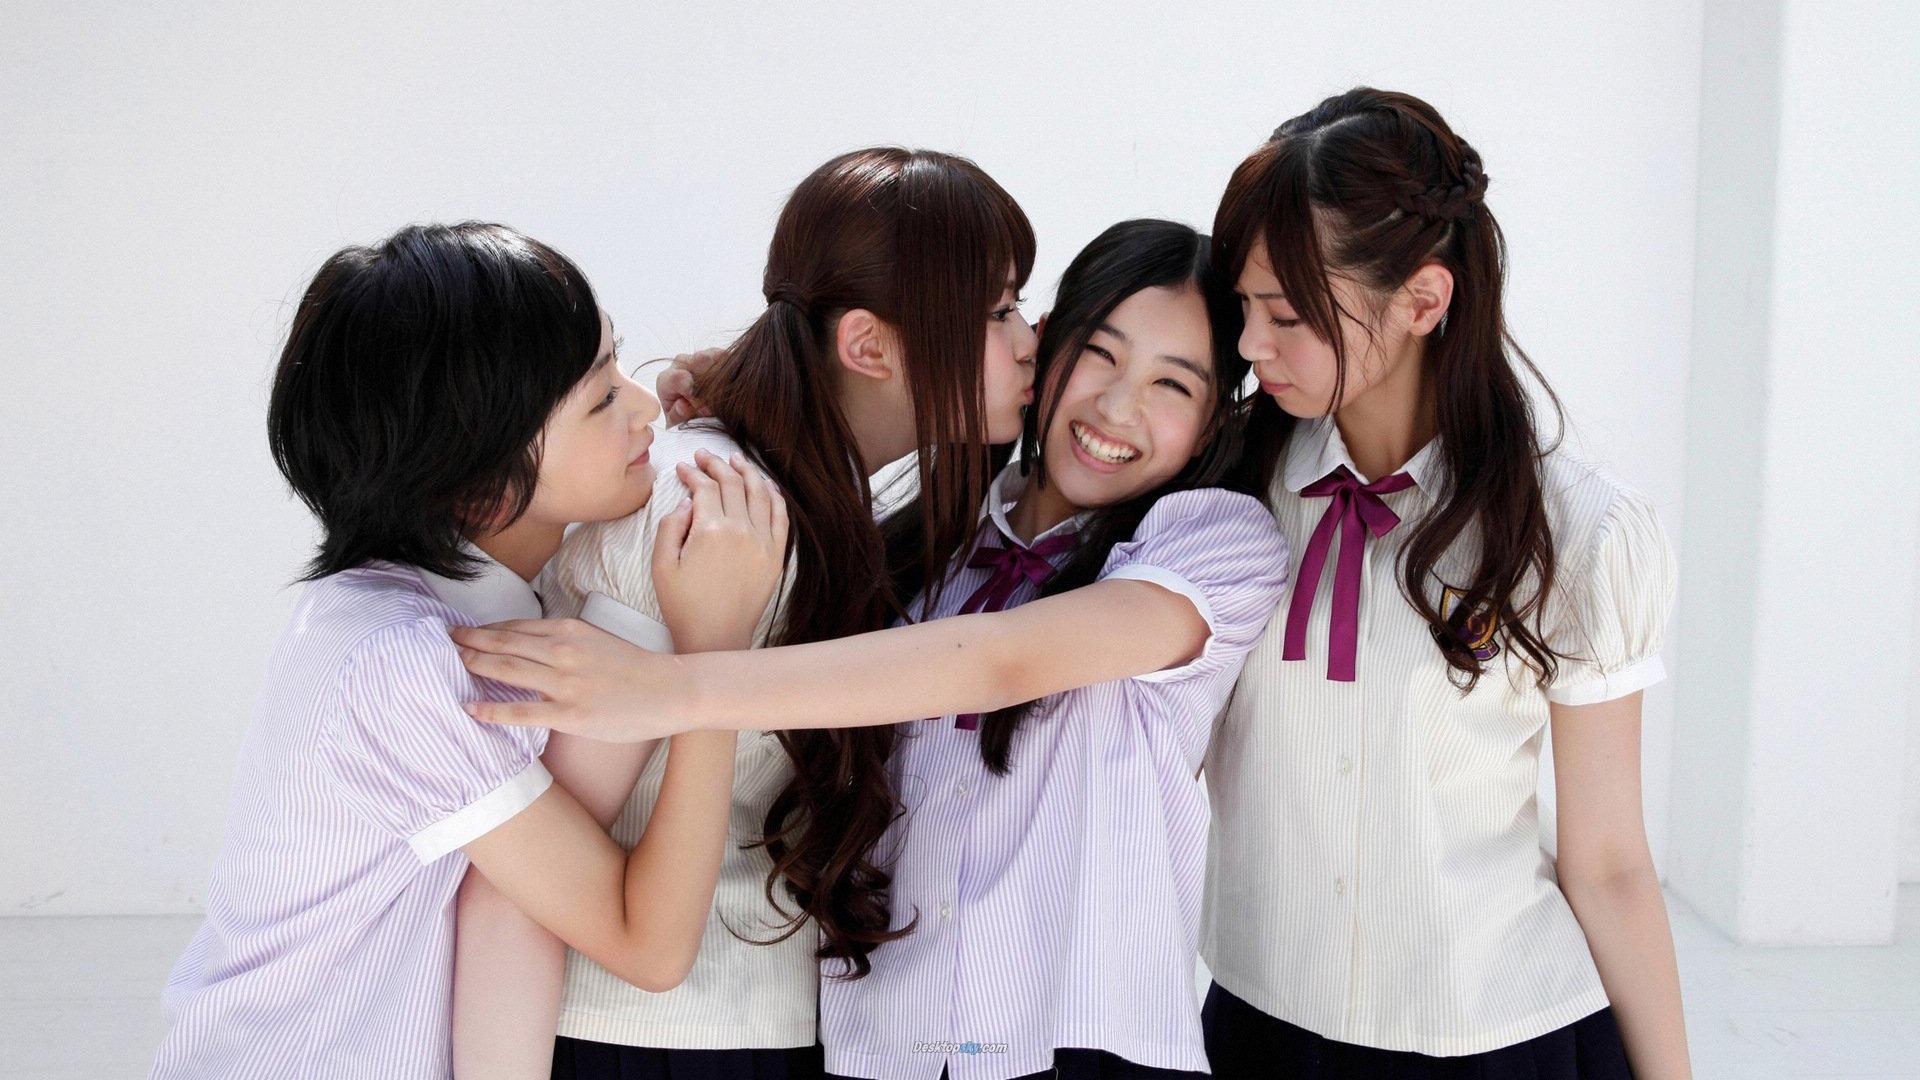 Nogizaka_46_Japan_beauty_popular_combina